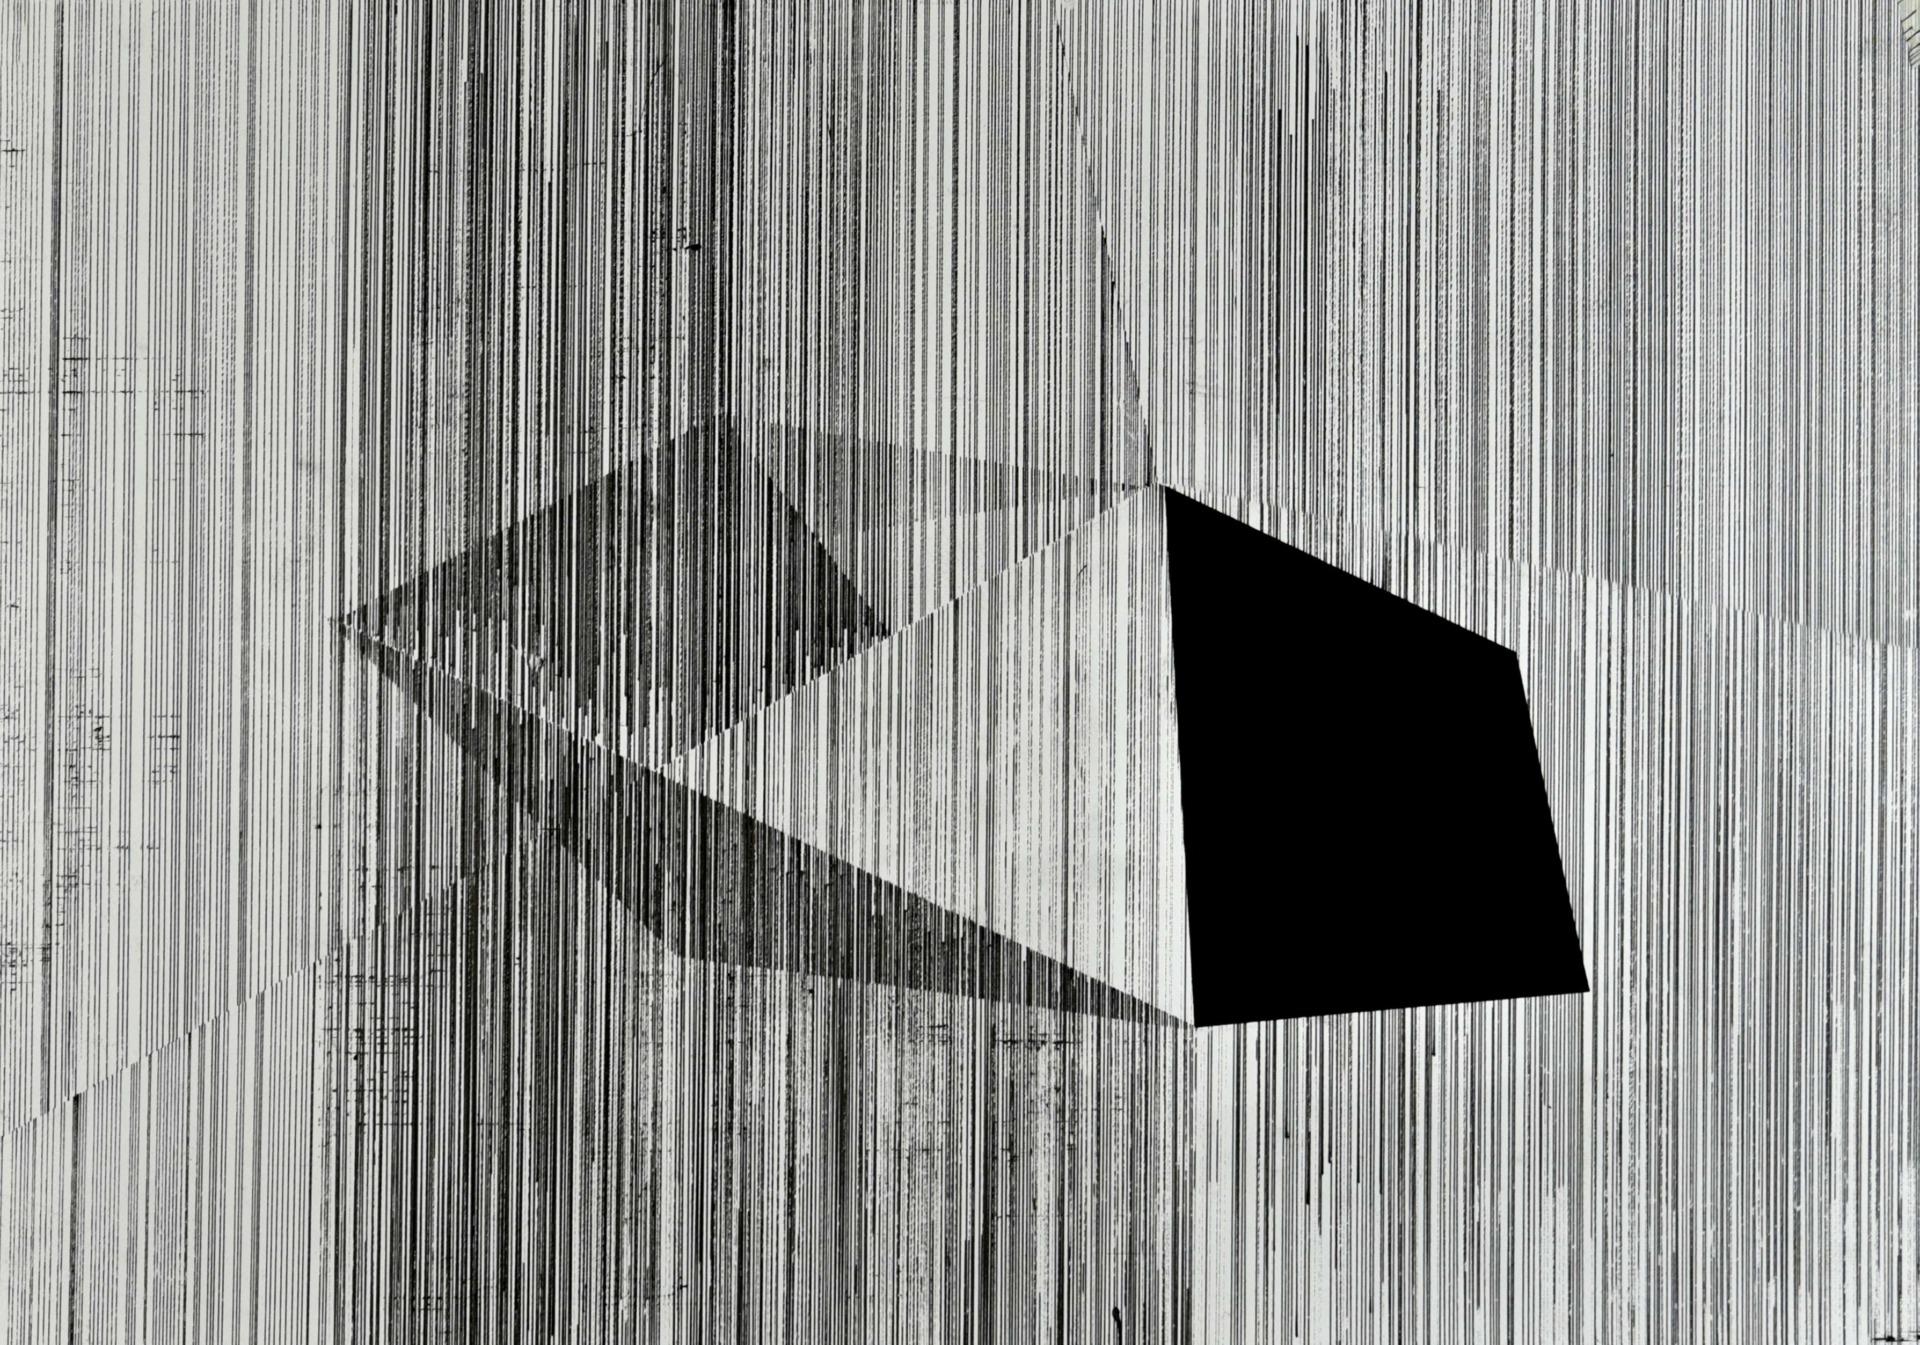 Contemporary art from Gyula Sági | Op.100221. 1